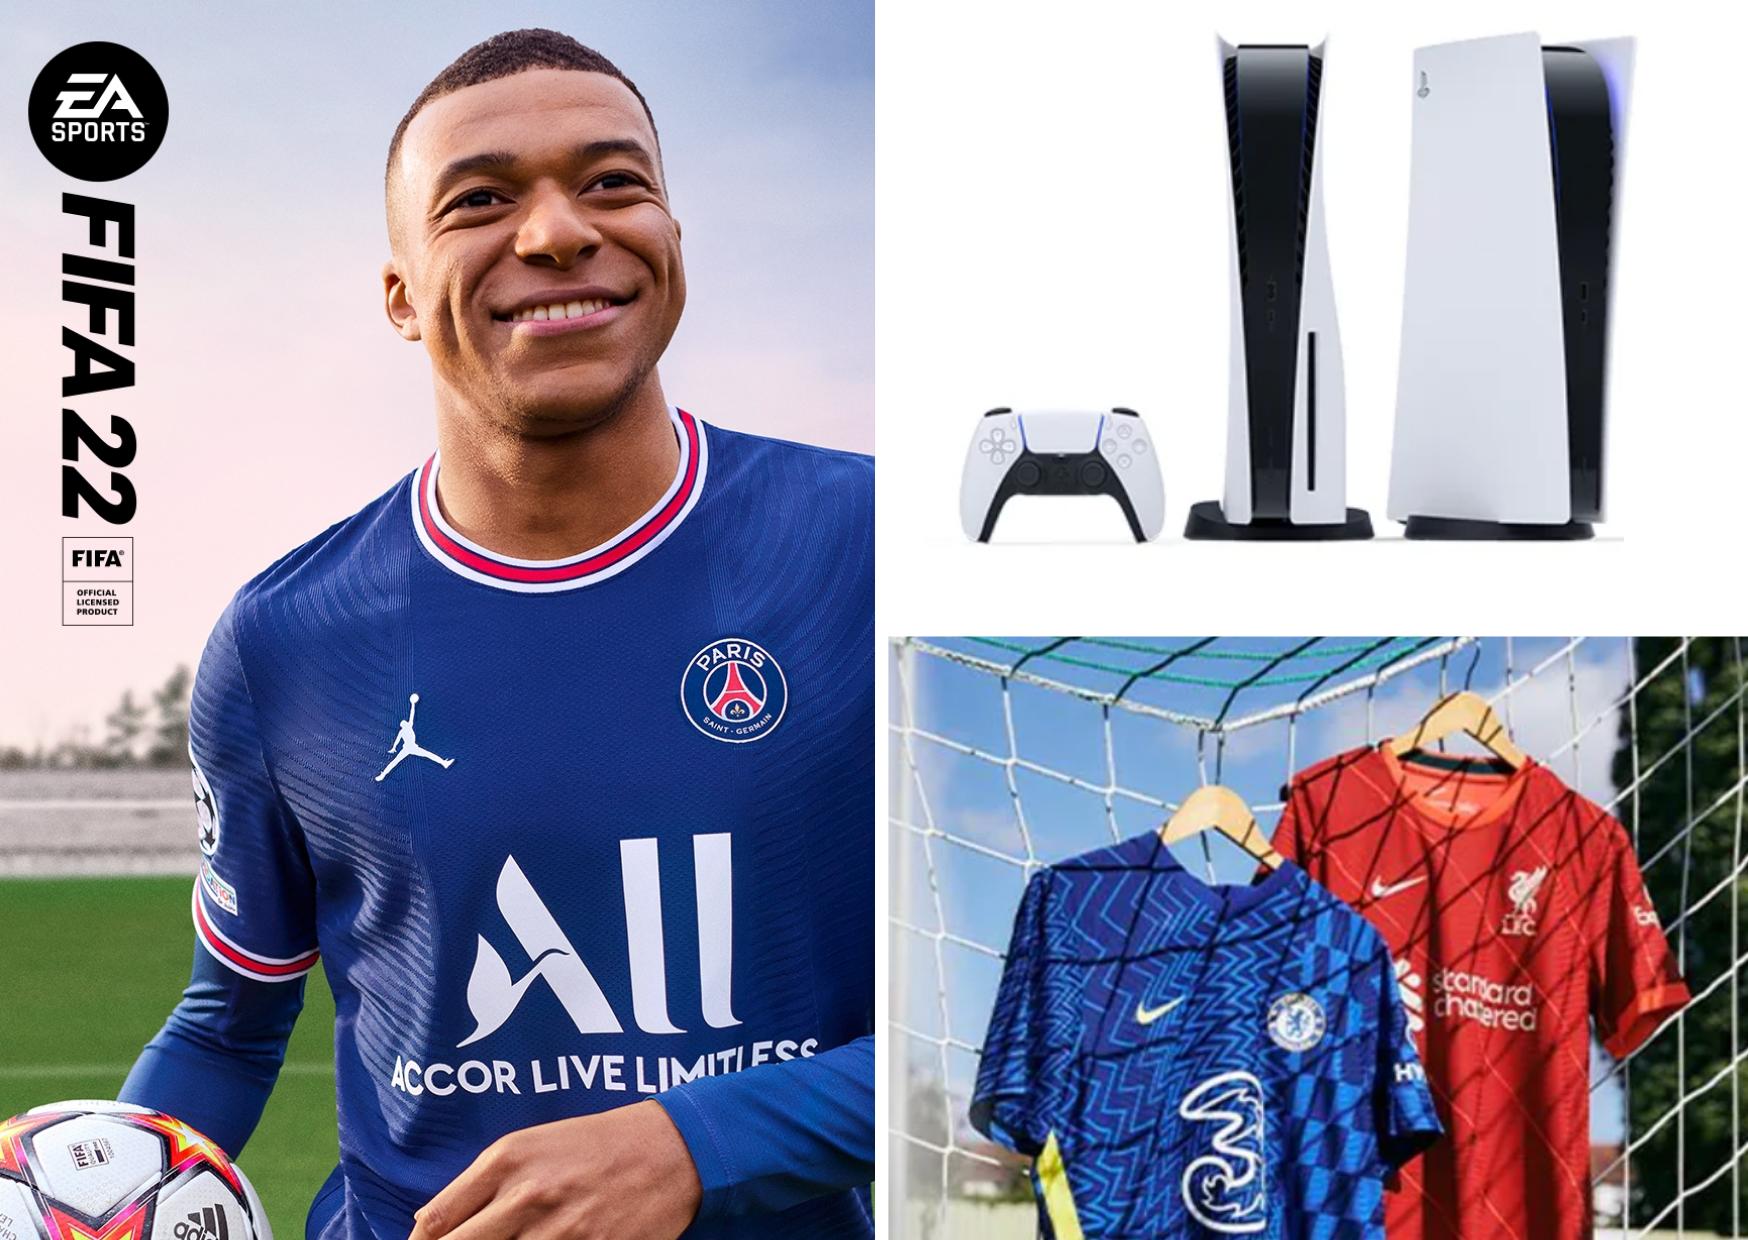 Win the ultimate FIFA 22 bundle!